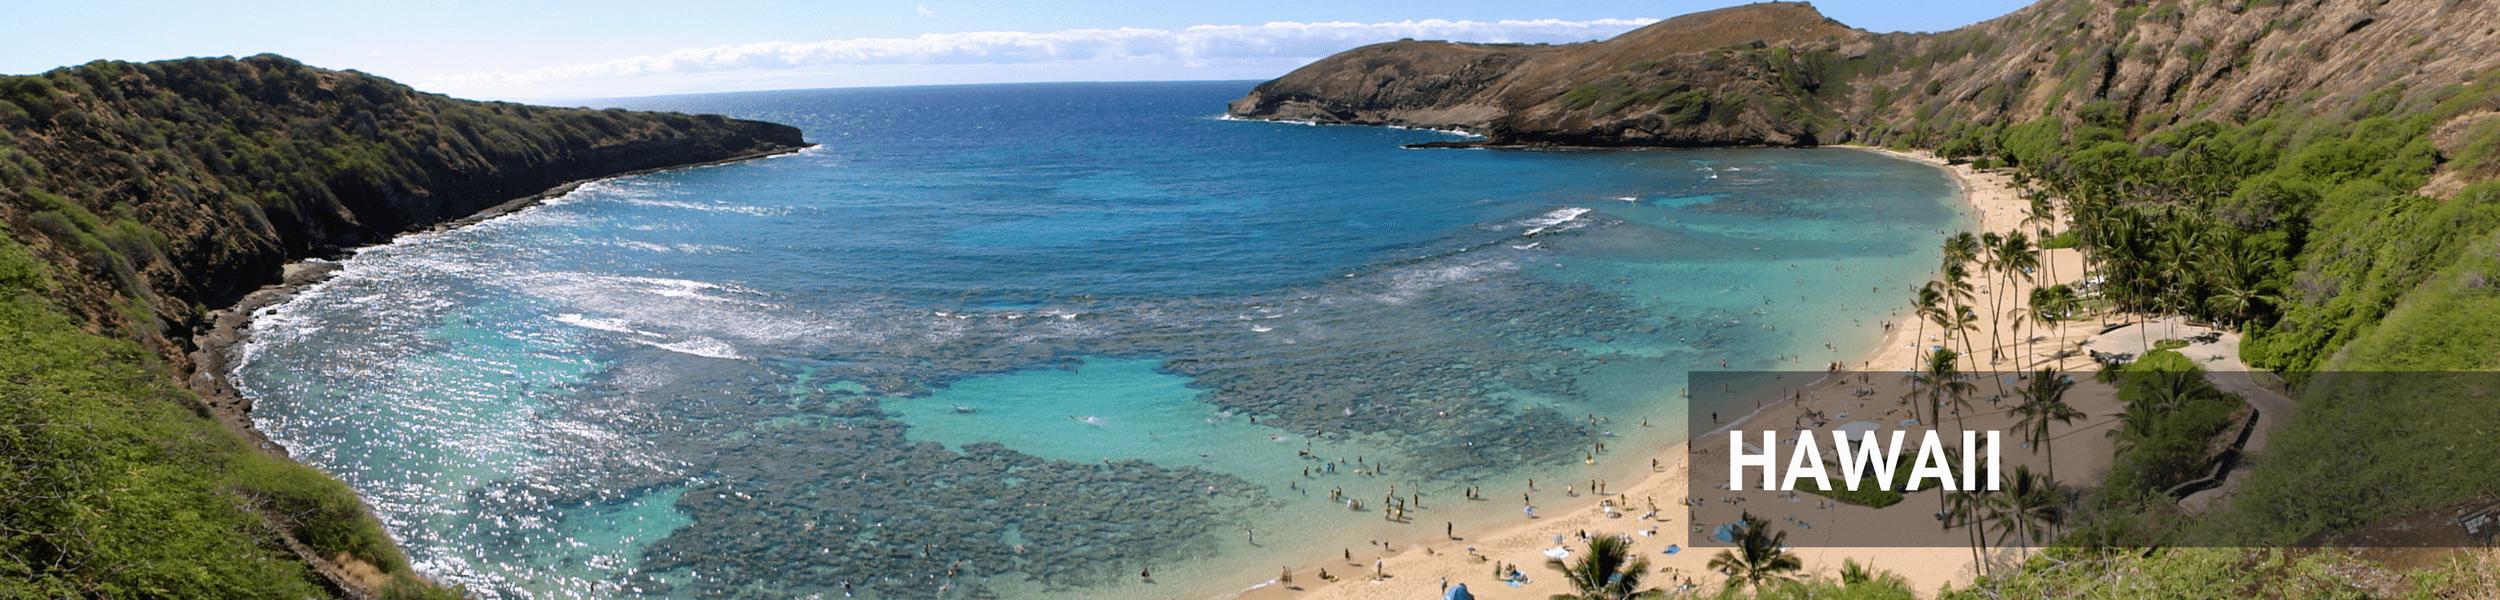 Best beaches in Oahu Hawaii